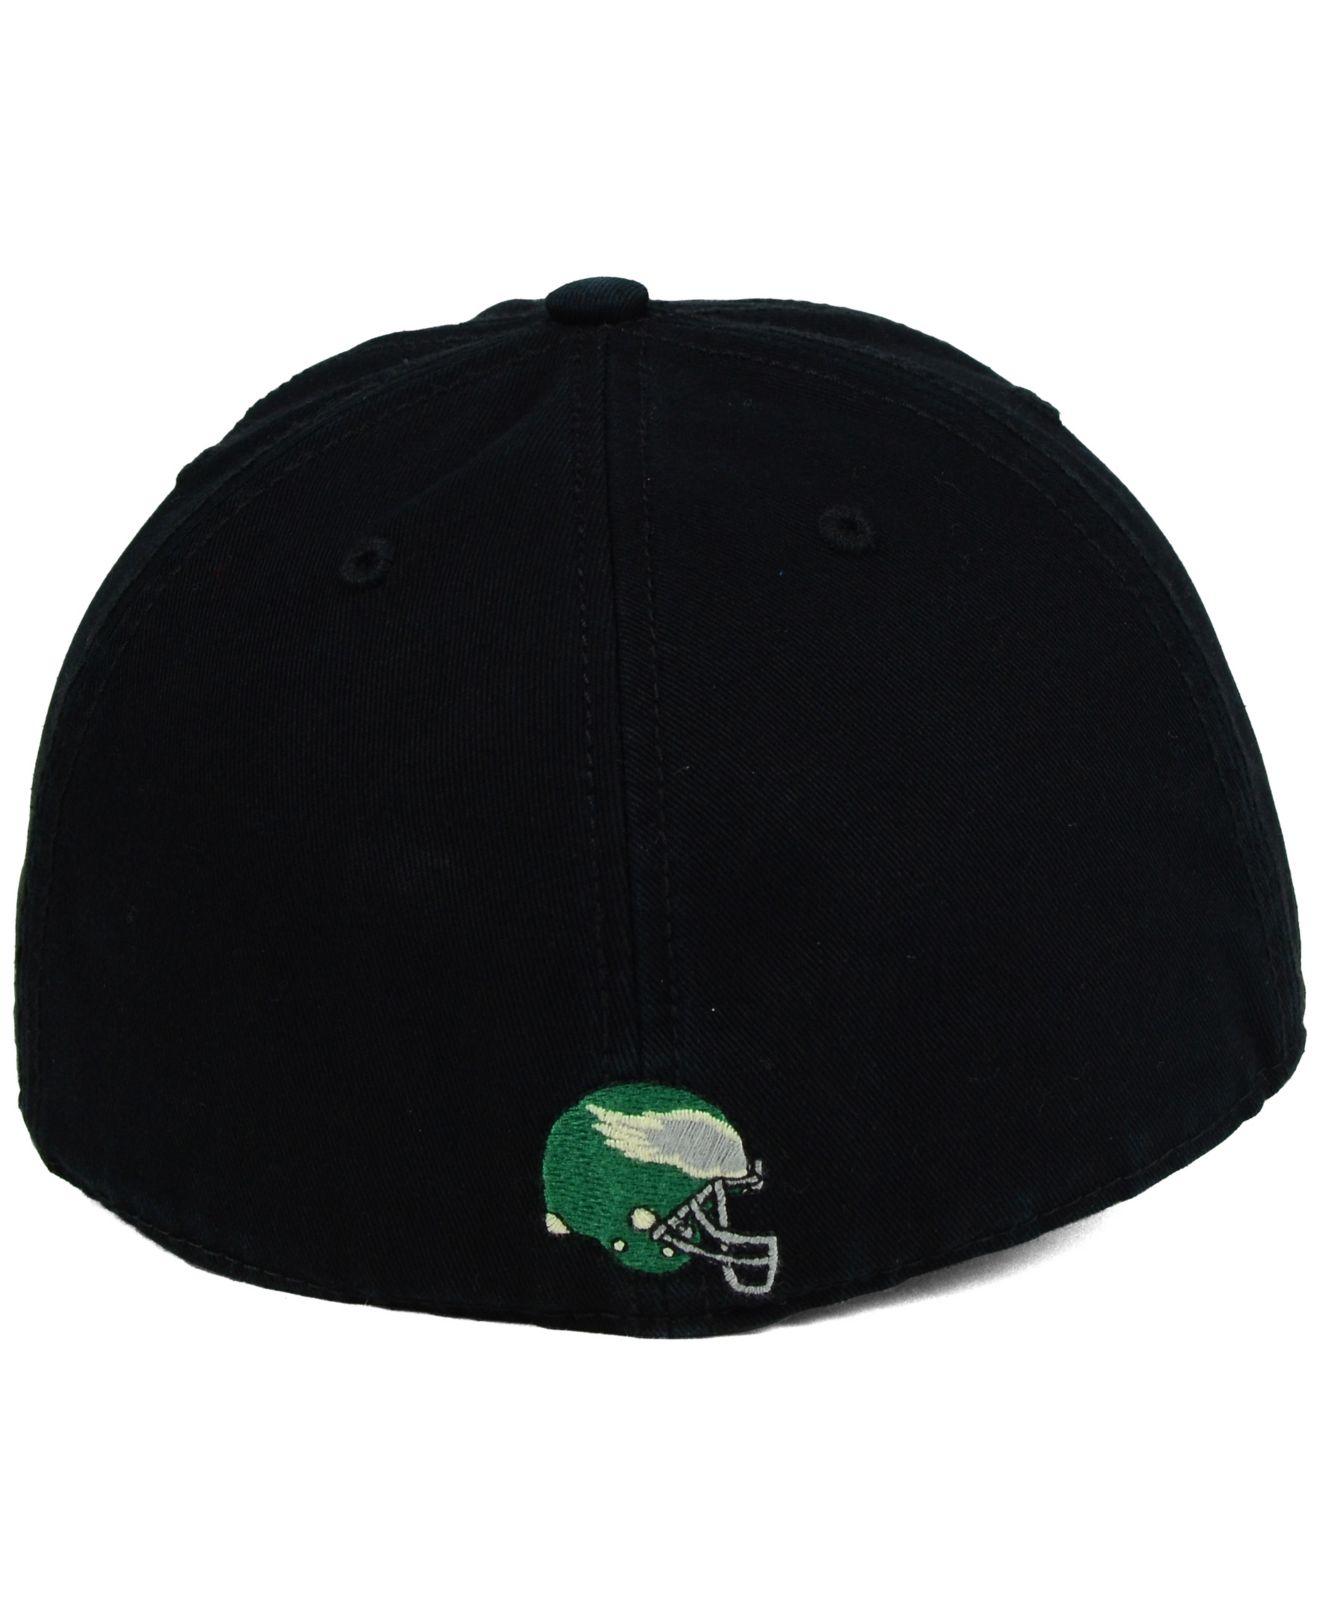 fa08276c295 Lyst - 47 Brand Philadelphia Eagles Papa Franchise Cap in Black for Men